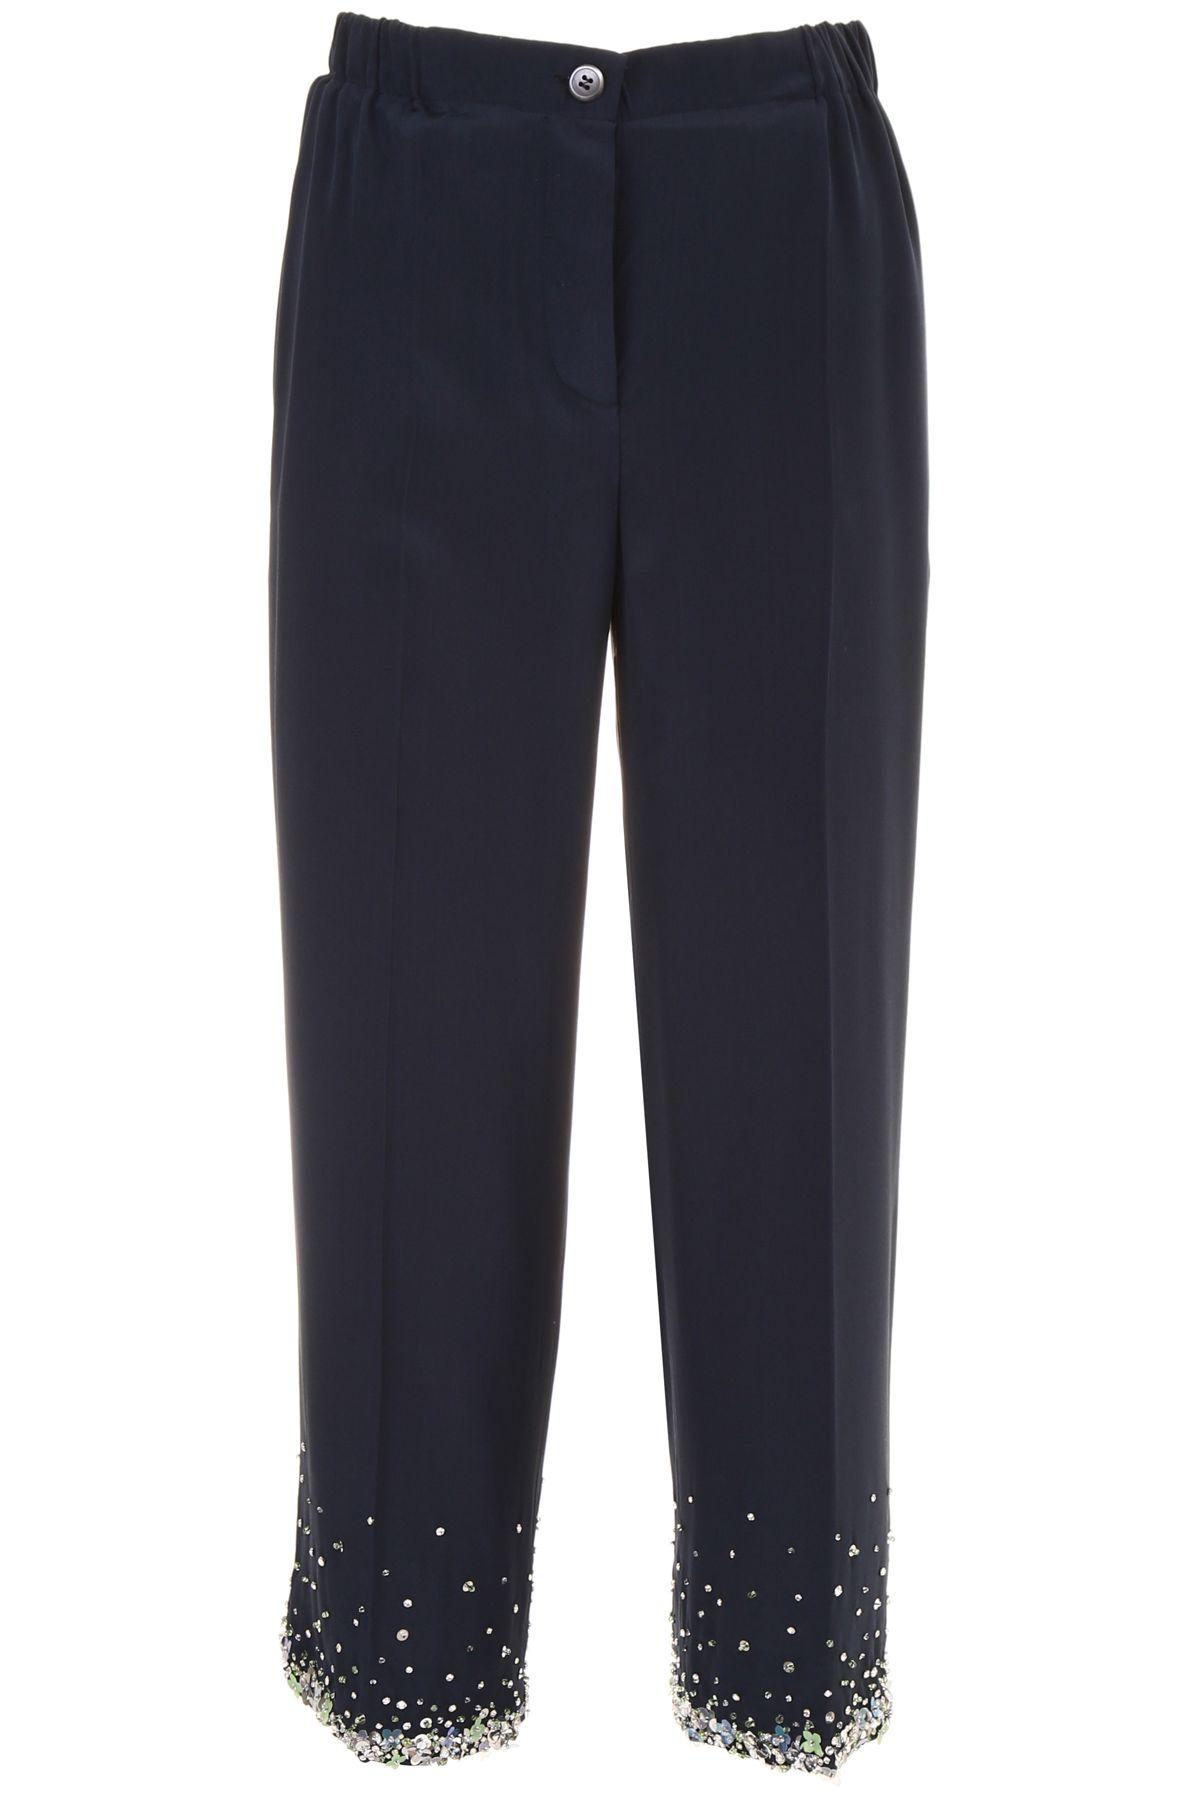 Miu Miu Embroidered Crepe De Chine Trousers